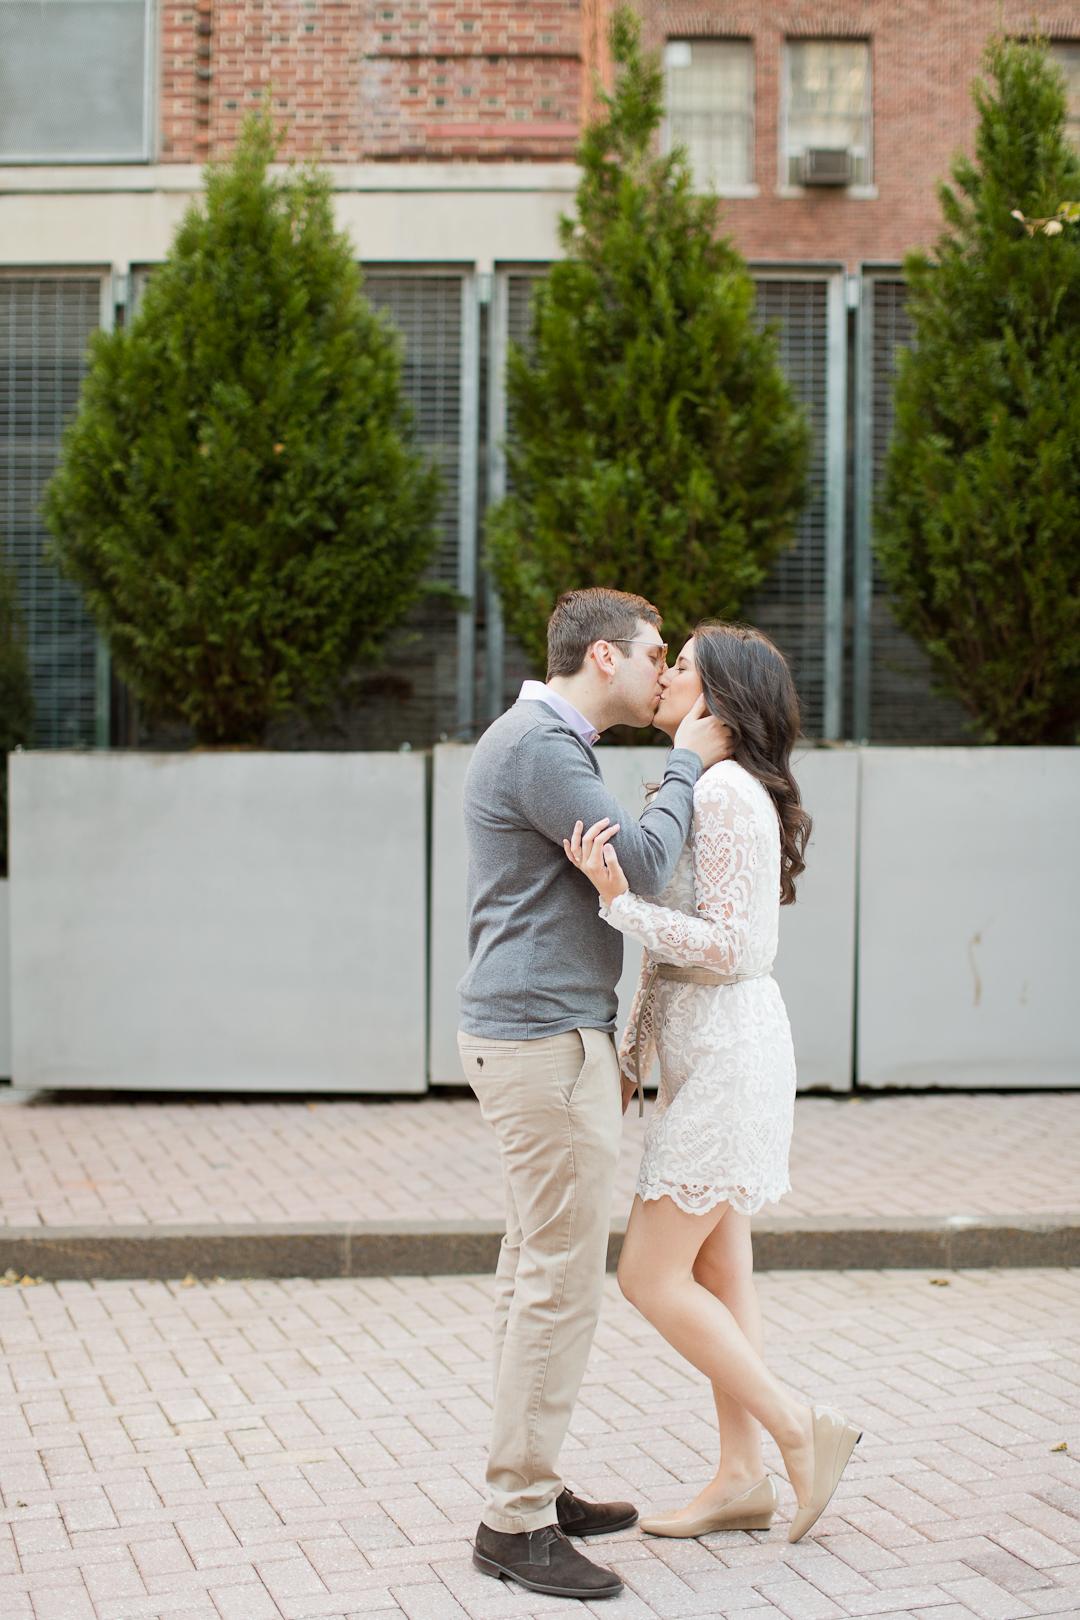 Melissa Kruse Photography - Christina & Alex Kips Bay Engagement Photos-54.jpg